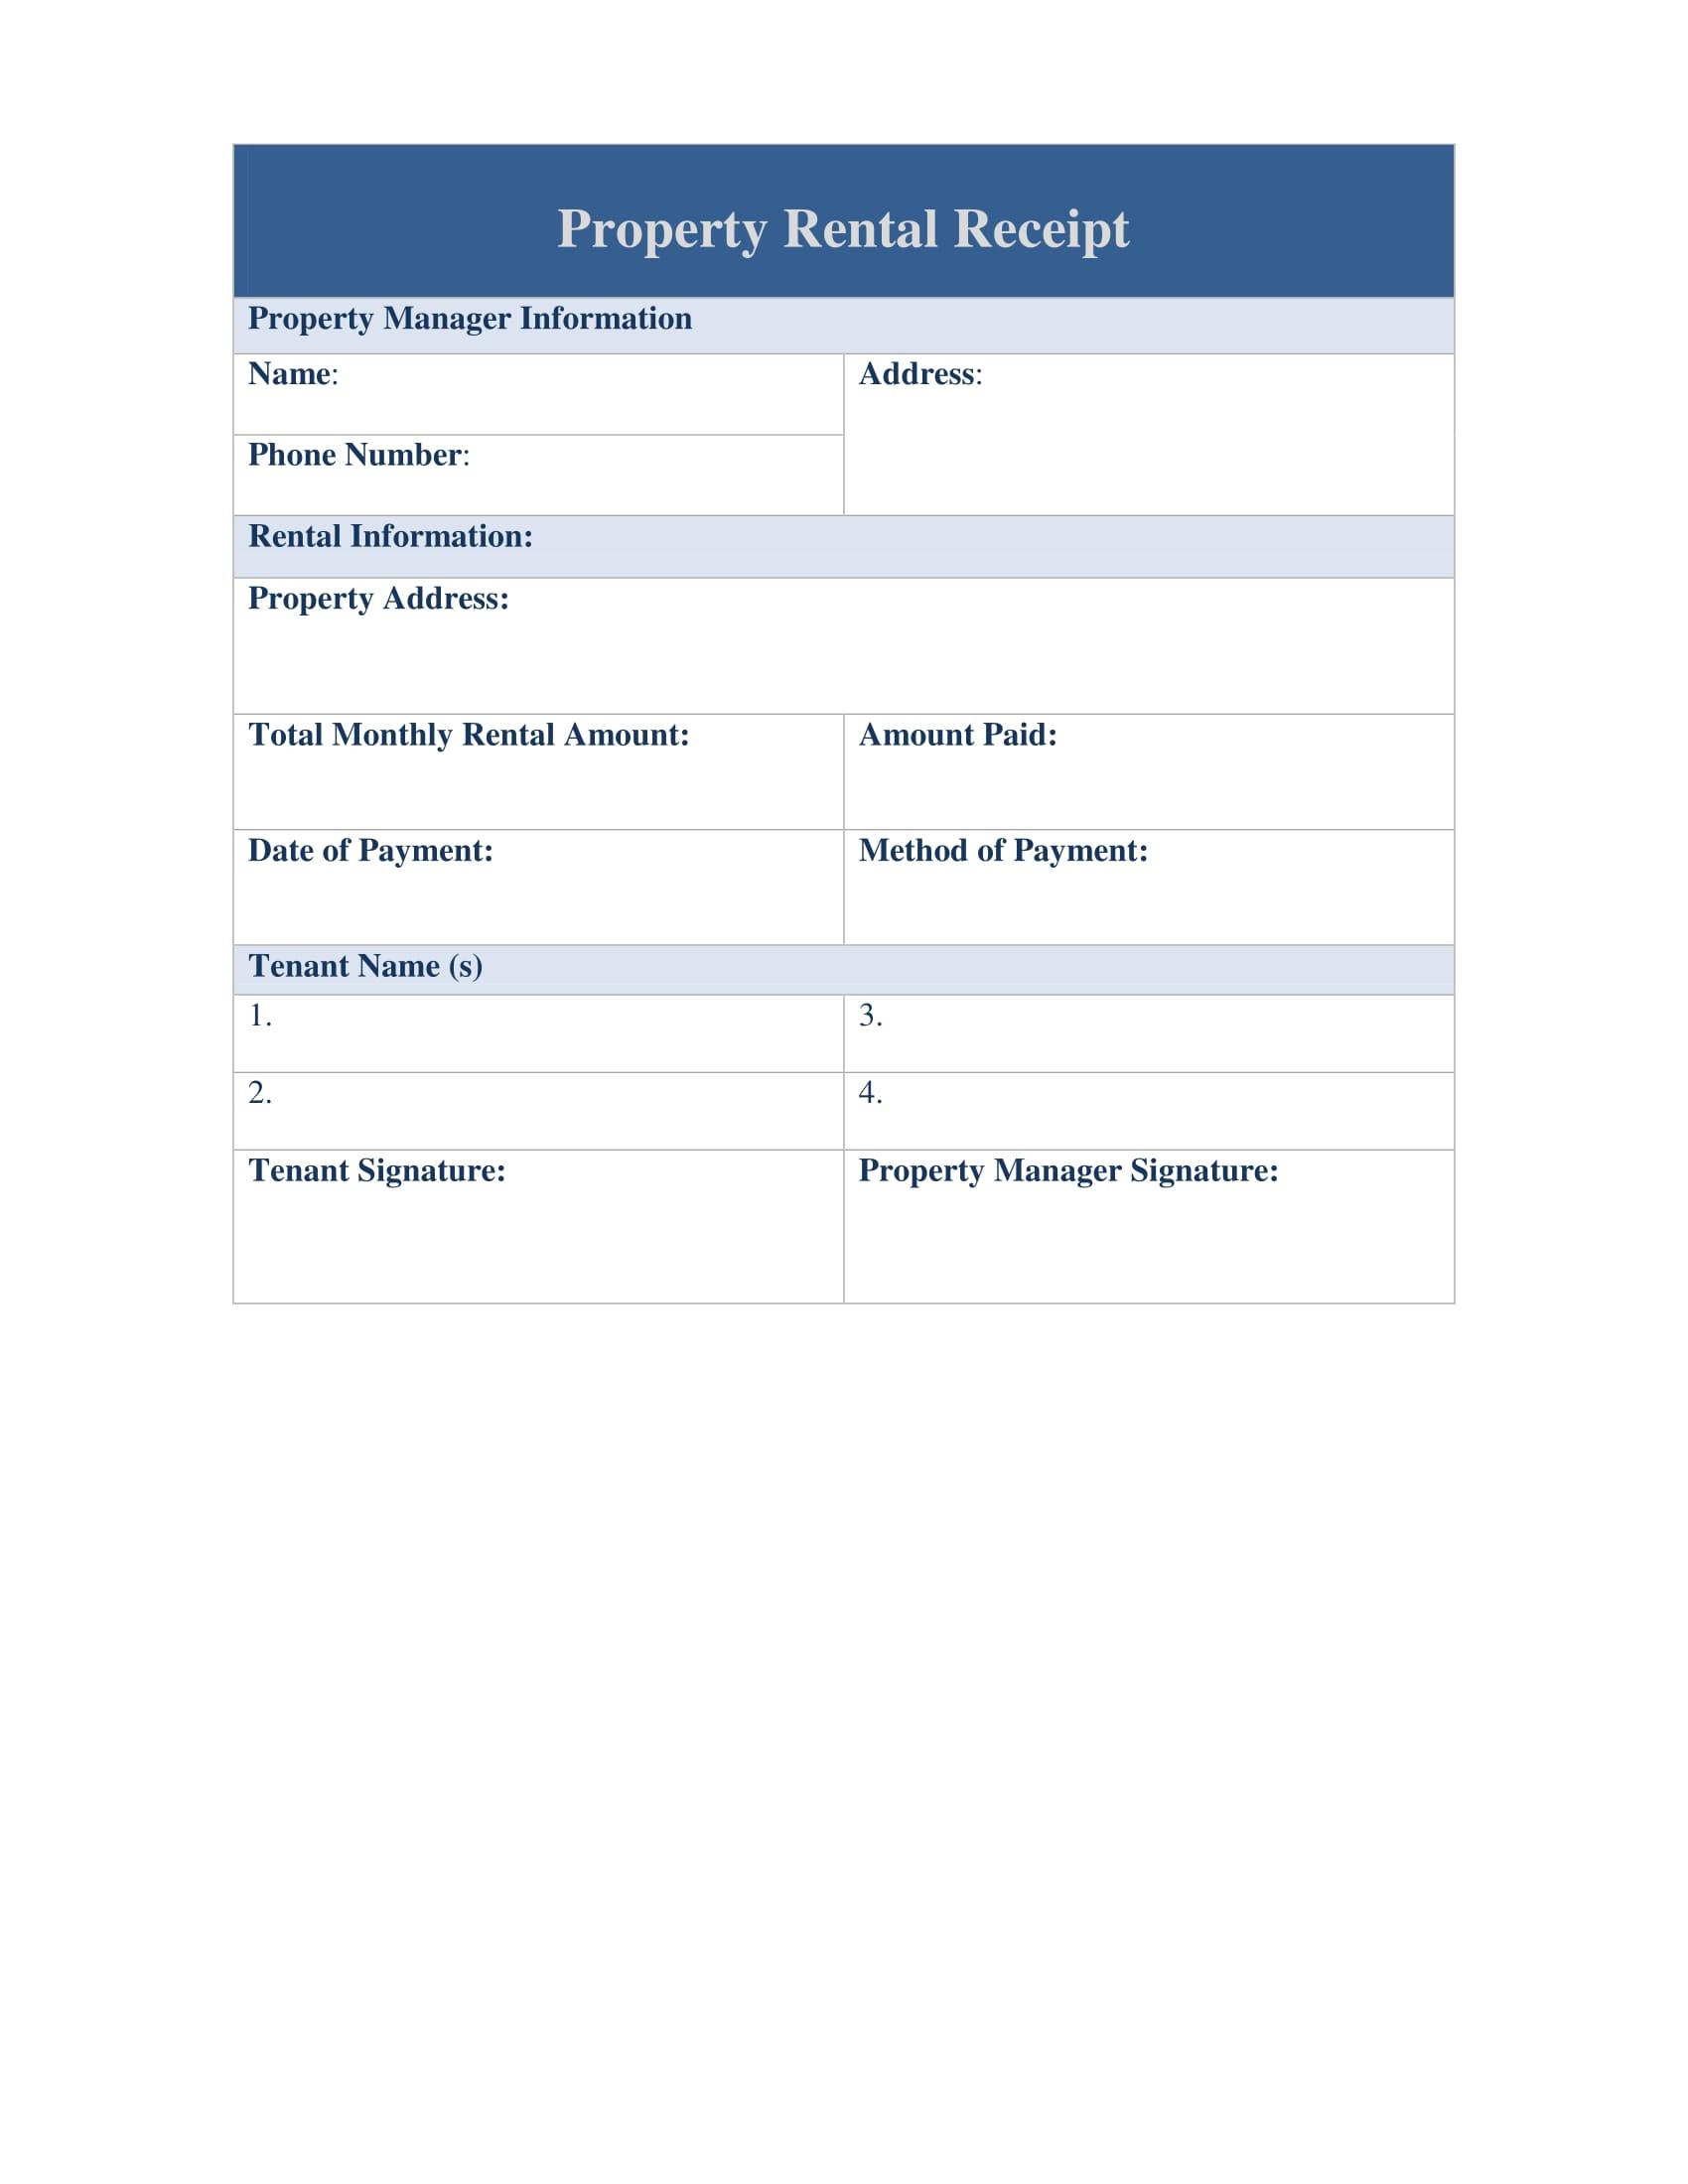 property rental receipt 1